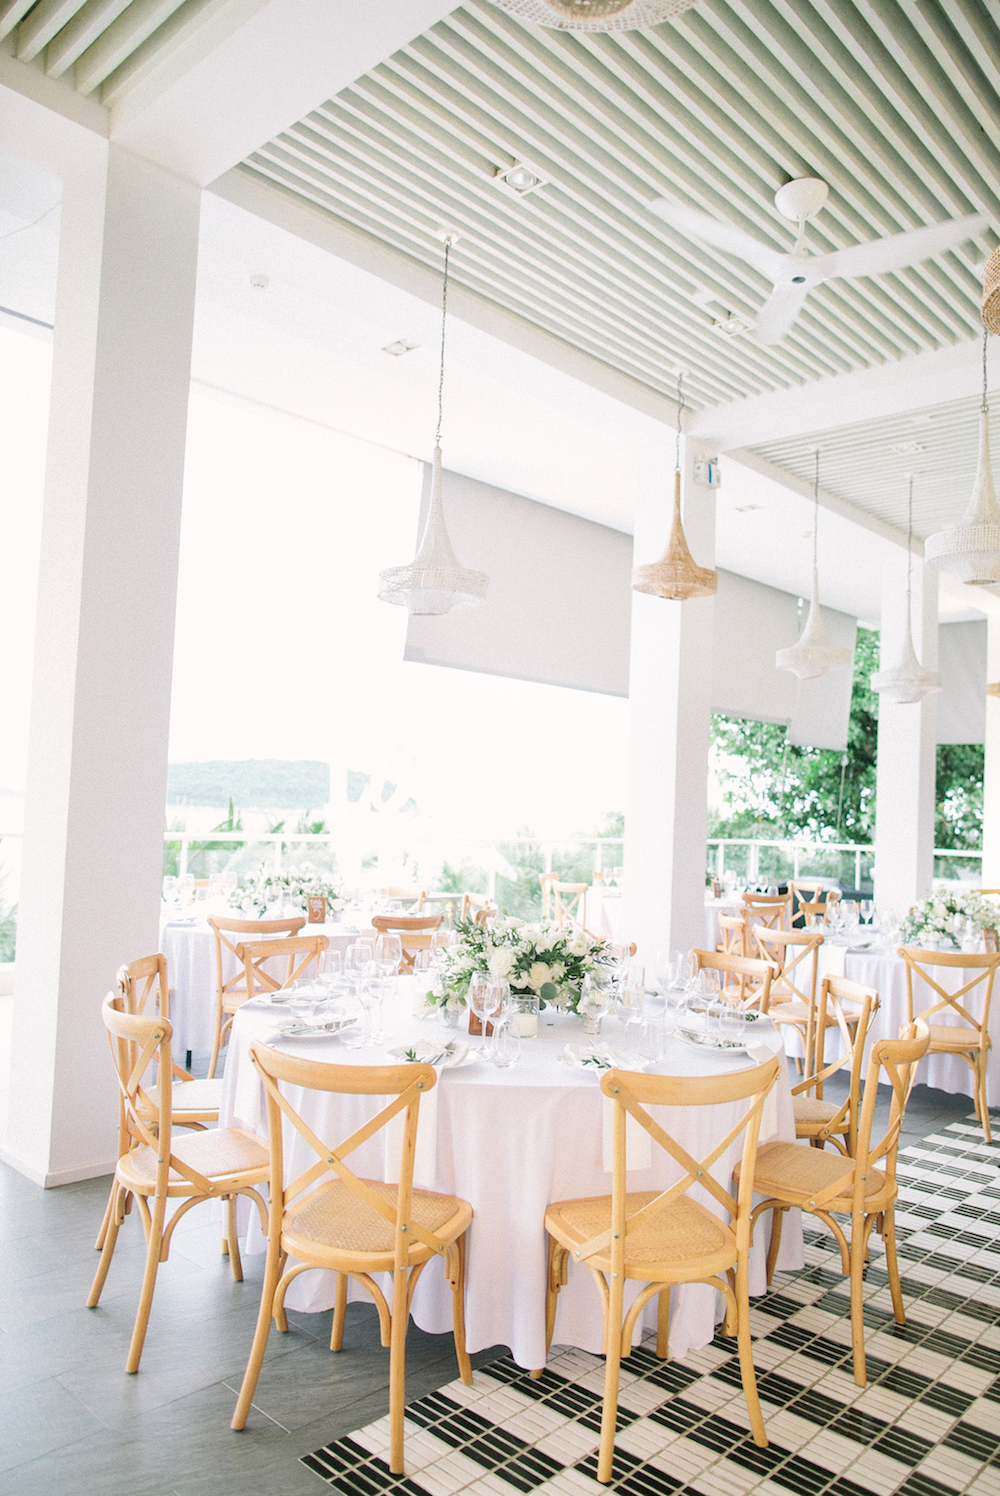 ©-saya-photography-studio-ohlala-wedding-photographer-photographe-mariage-the-naiharn-phuket-209.jpg